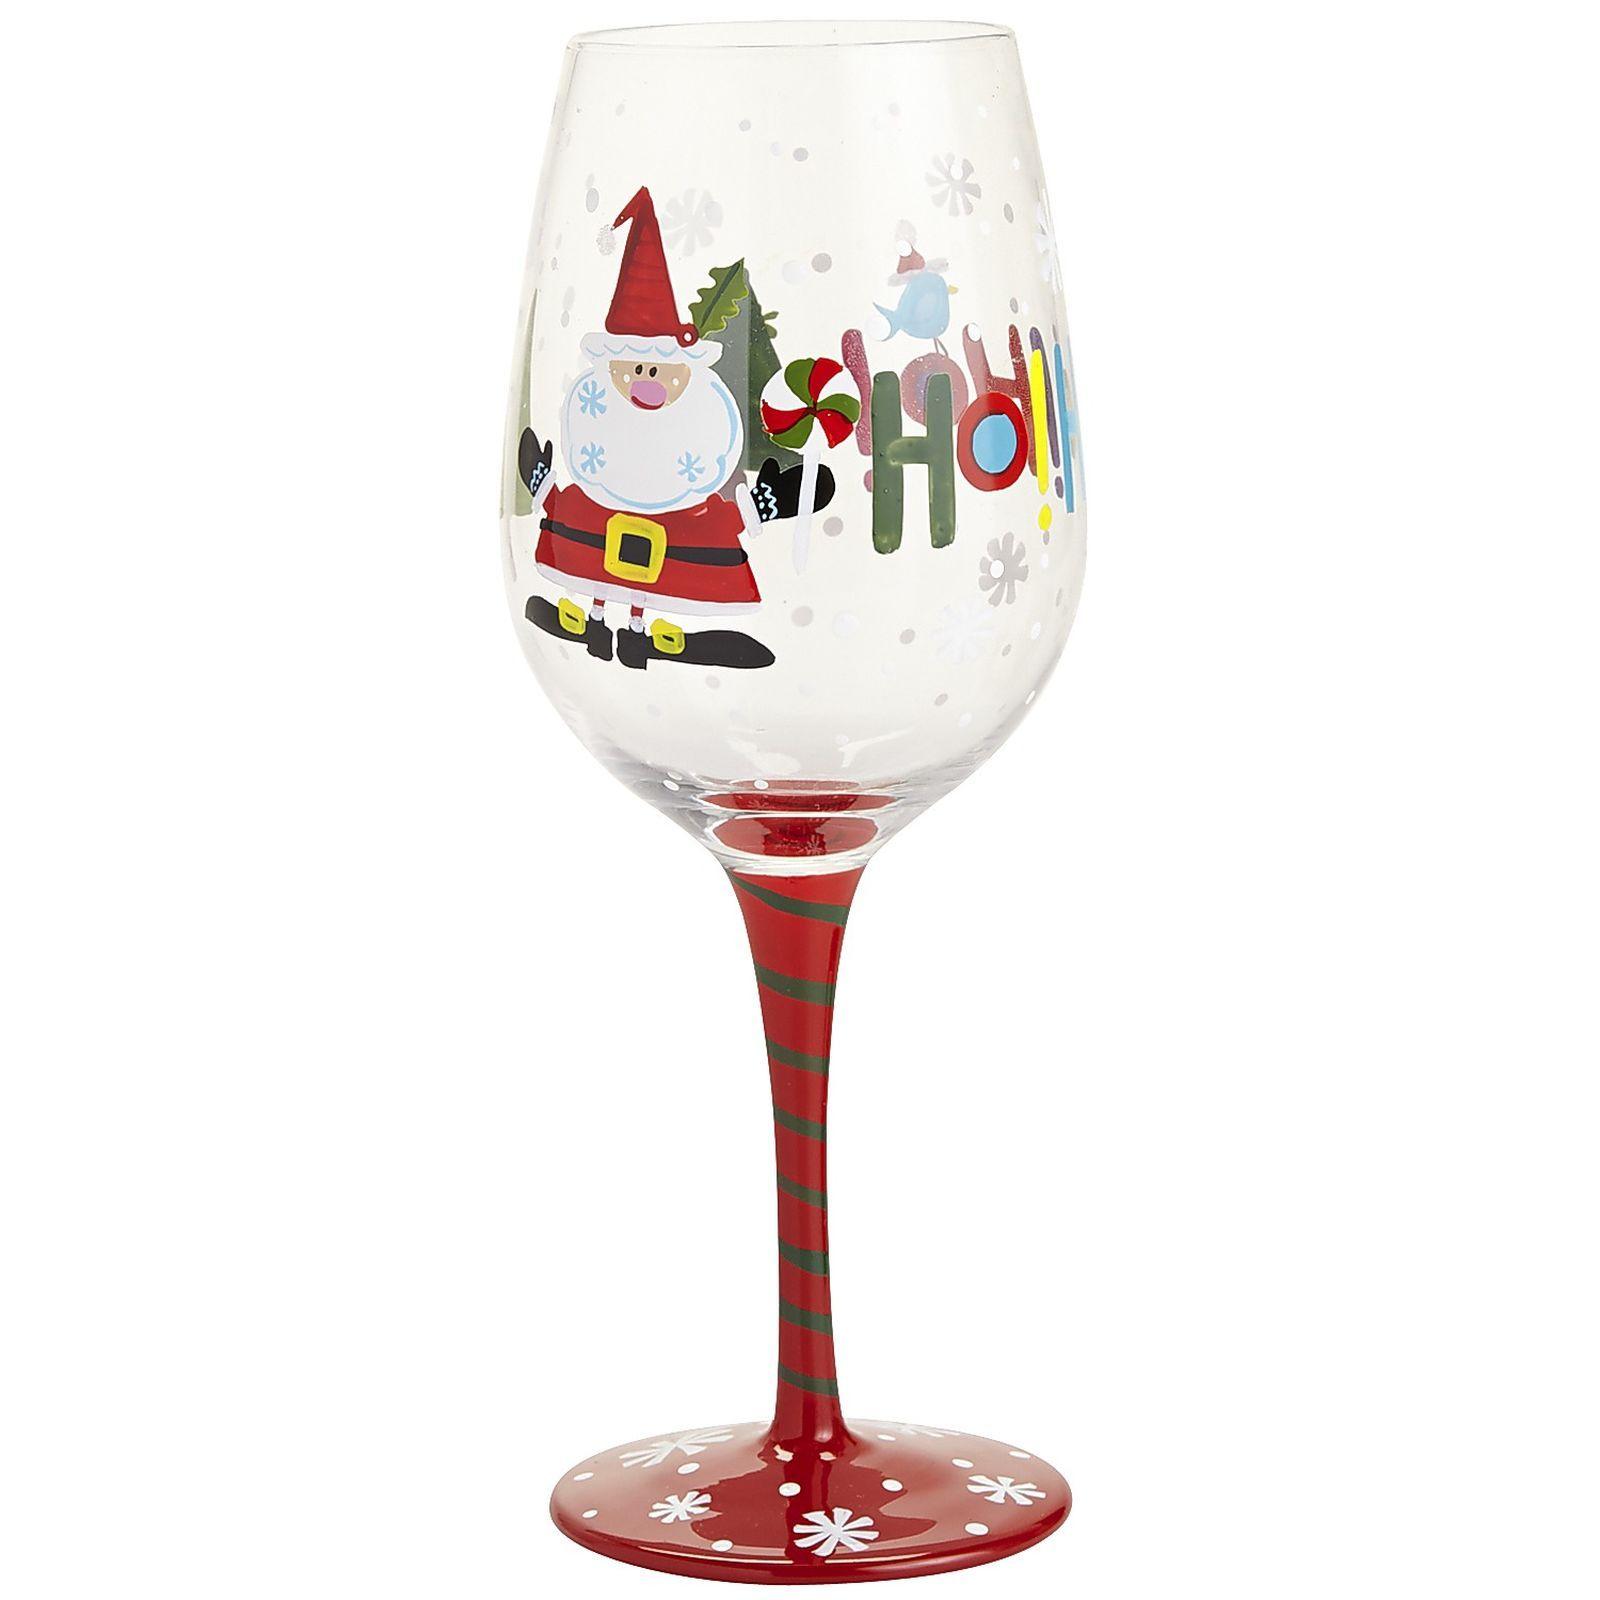 Santa Painted Wine Glass Wine Glass Painted Wine Glass Glass